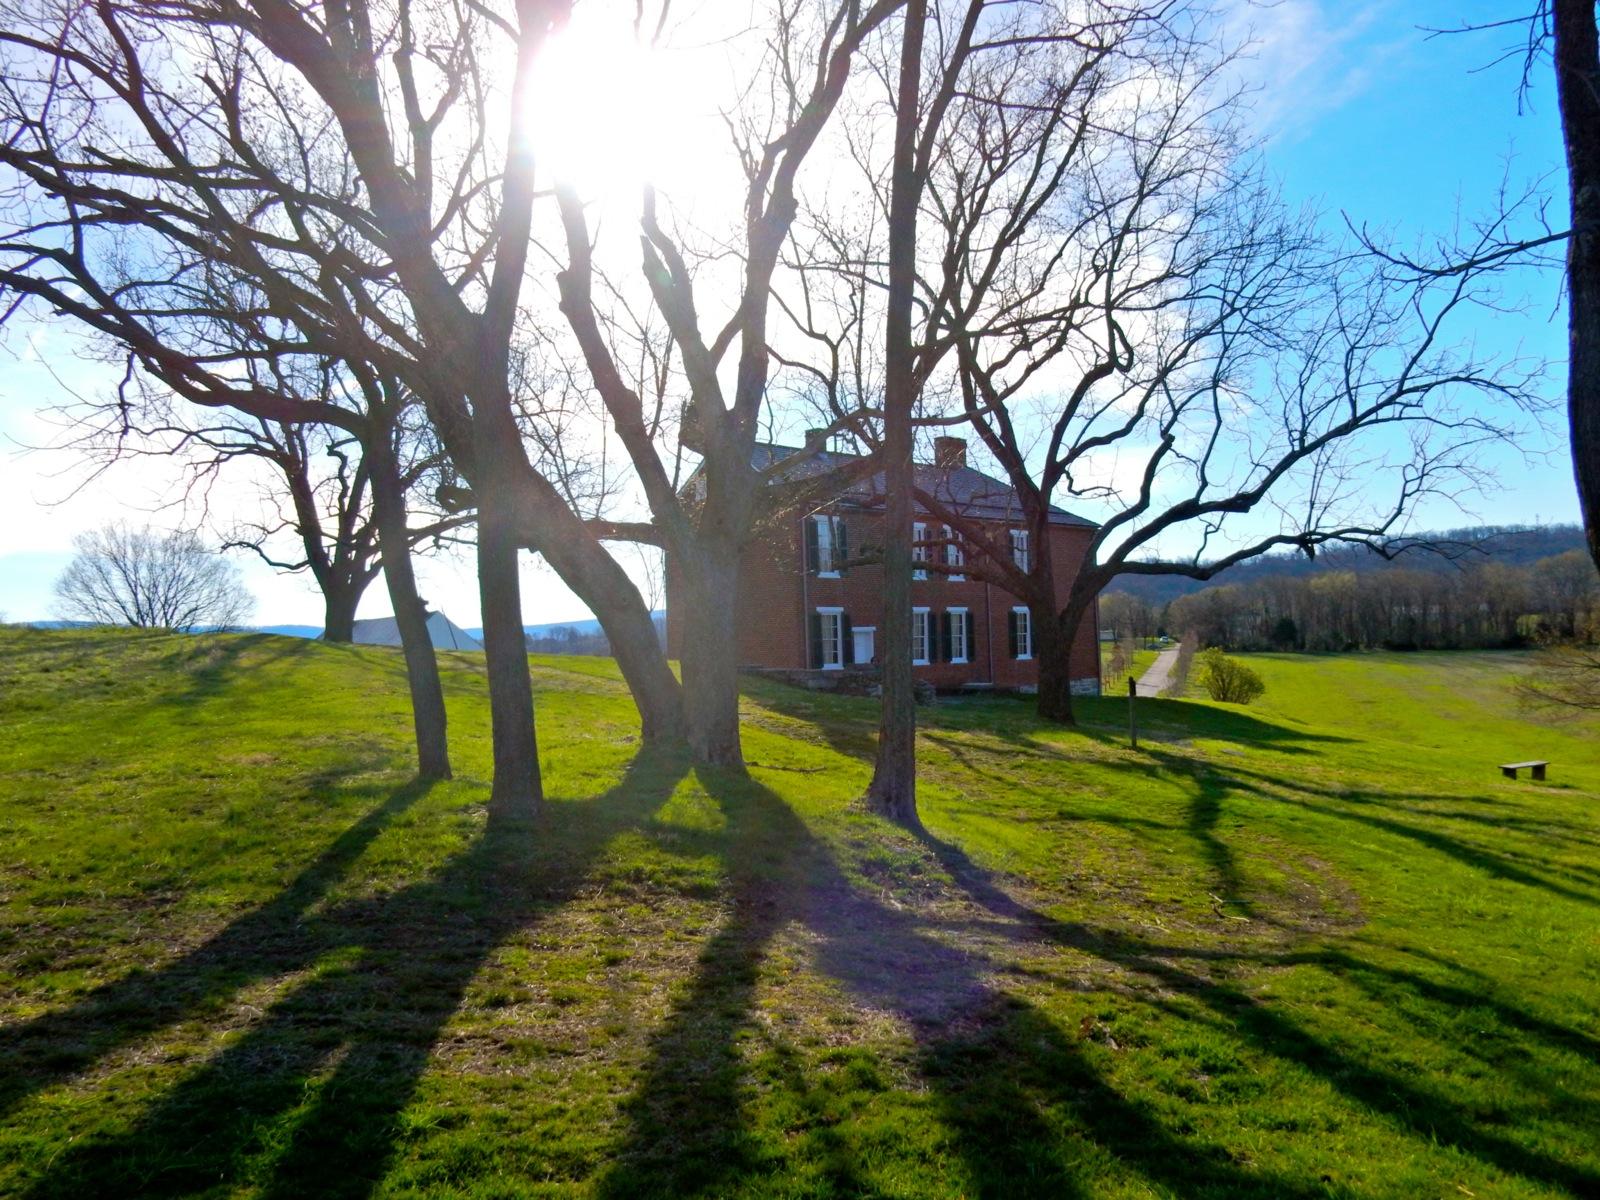 Washington County MD: Hagerstown, Antietam, Nora Roberts